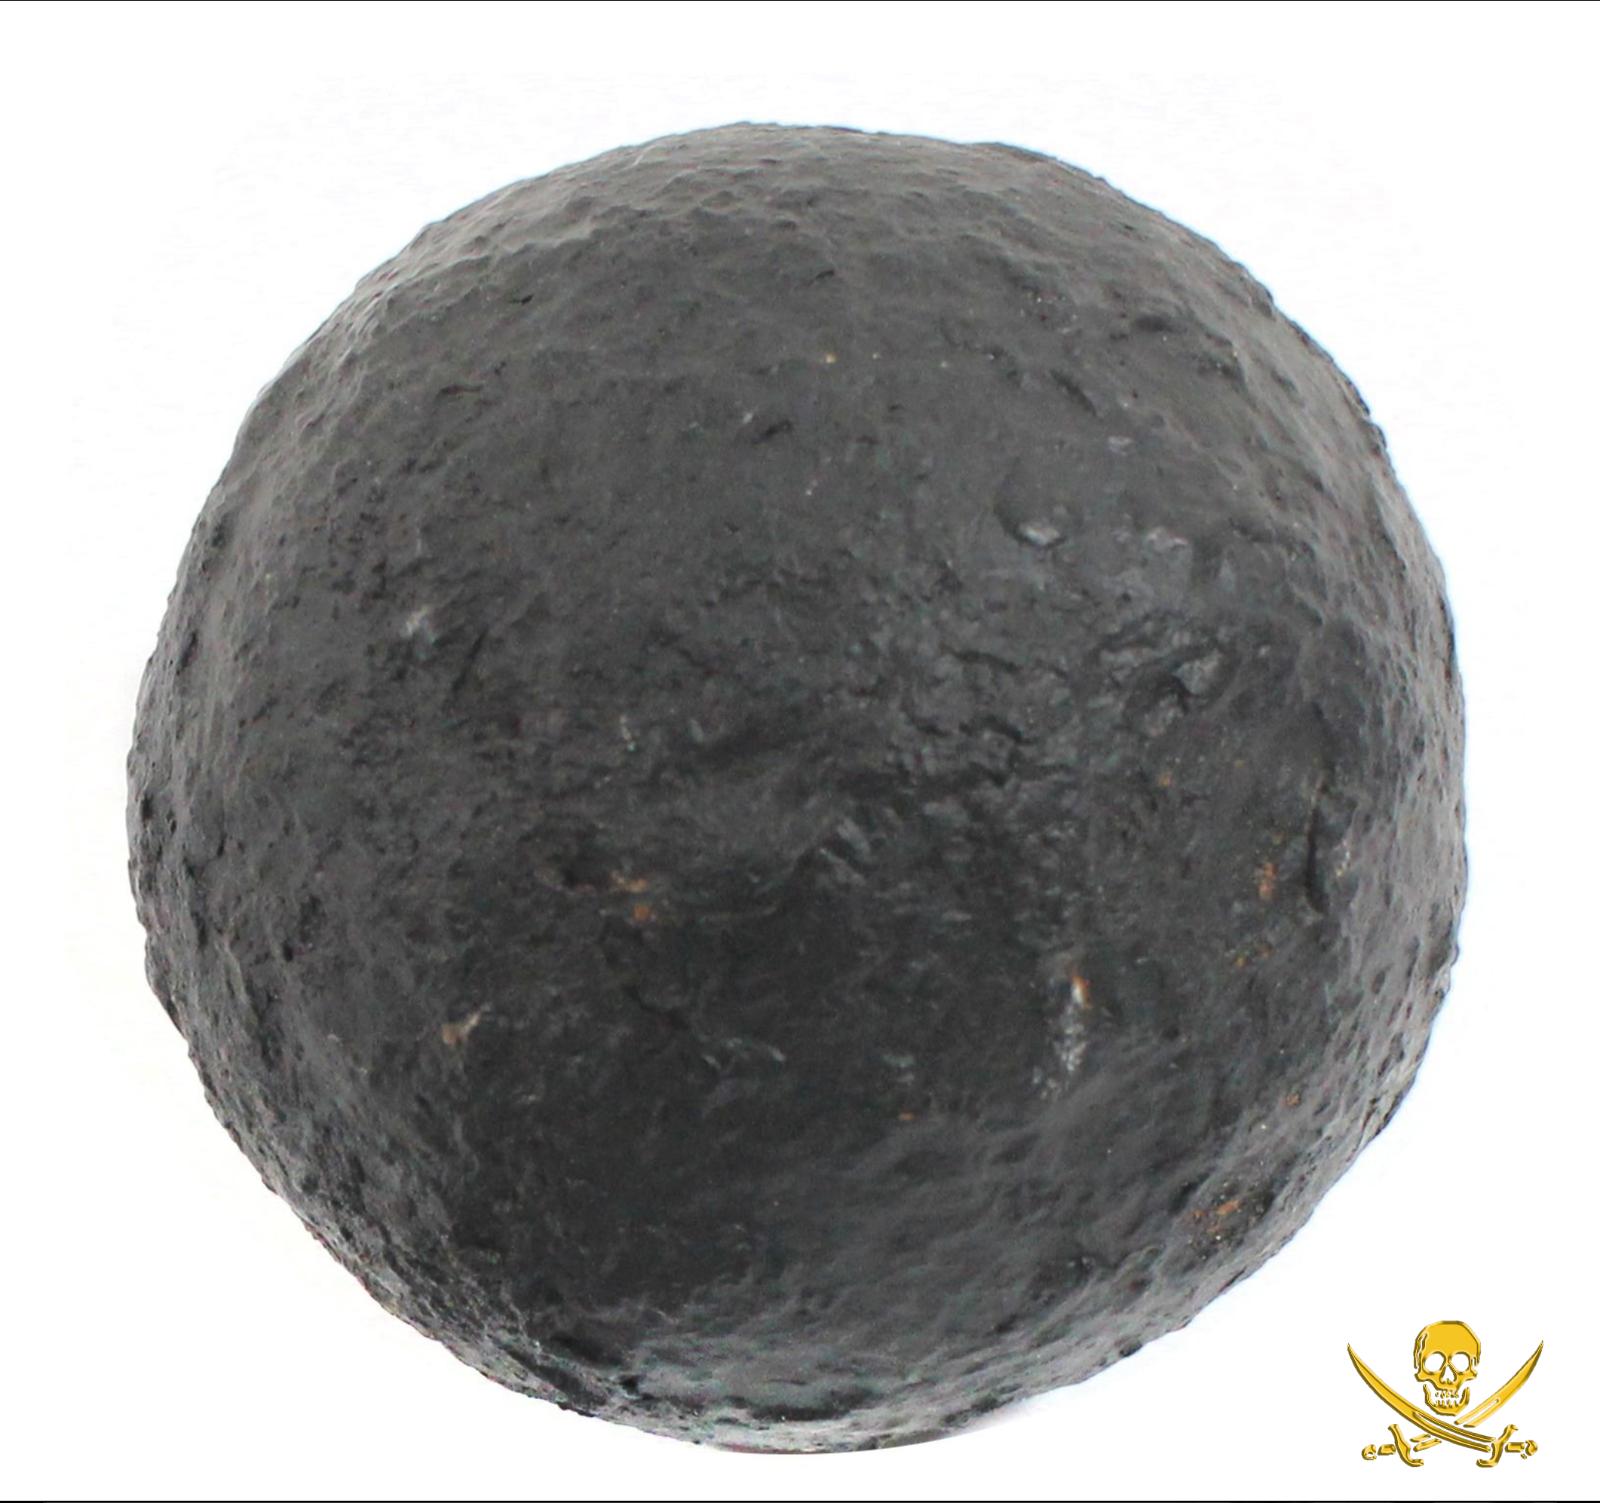 "IRON CANNONBALL 919gms 2 1/2"" PIRATE GOLD COINS SHIPWRECK TREASURE CANNON BALL"